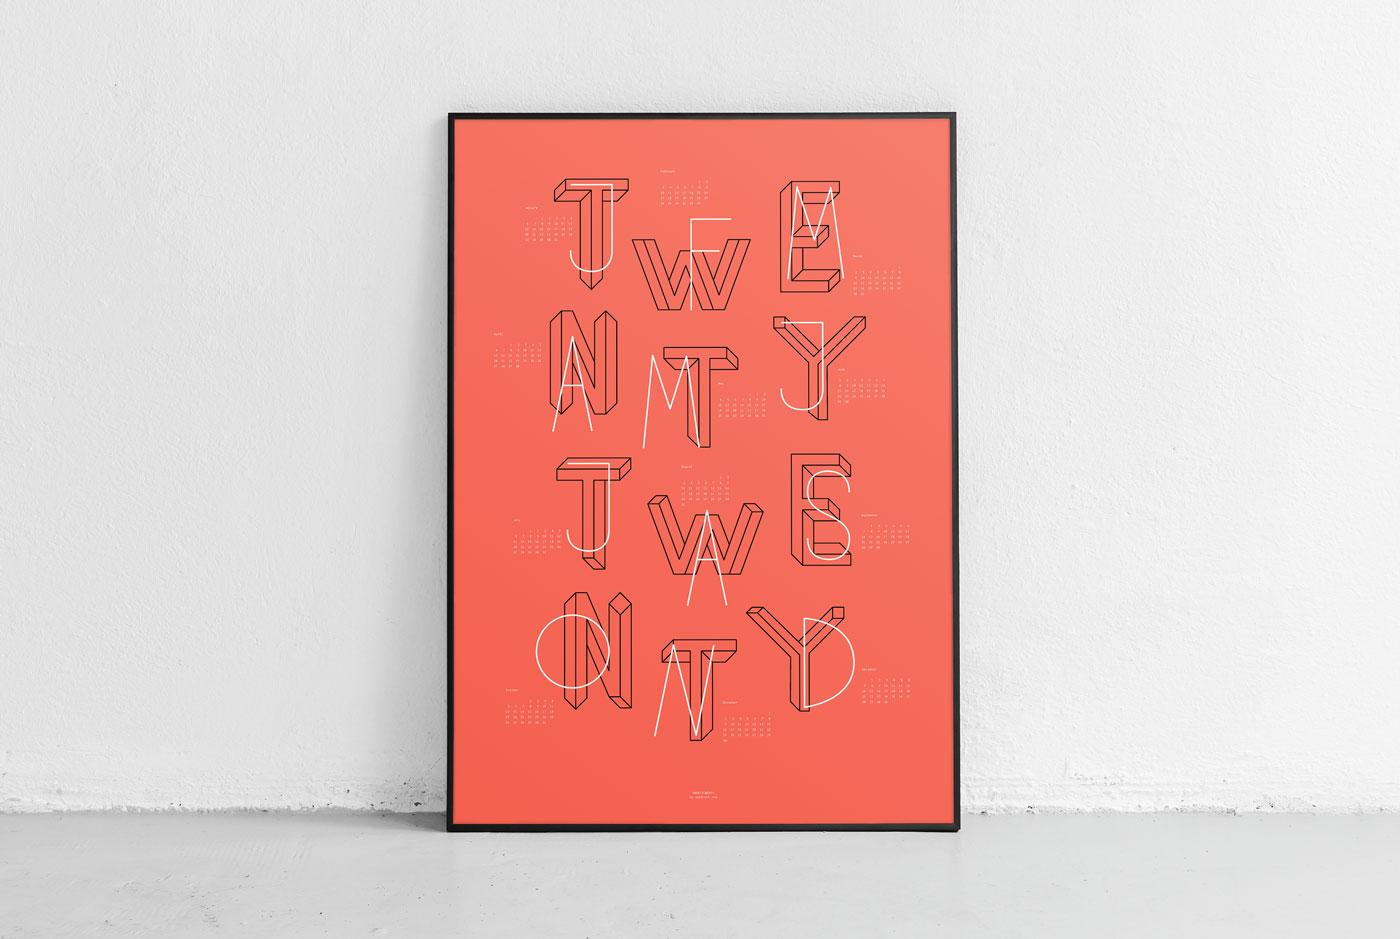 upstruct calendar 2020 - typographic poster